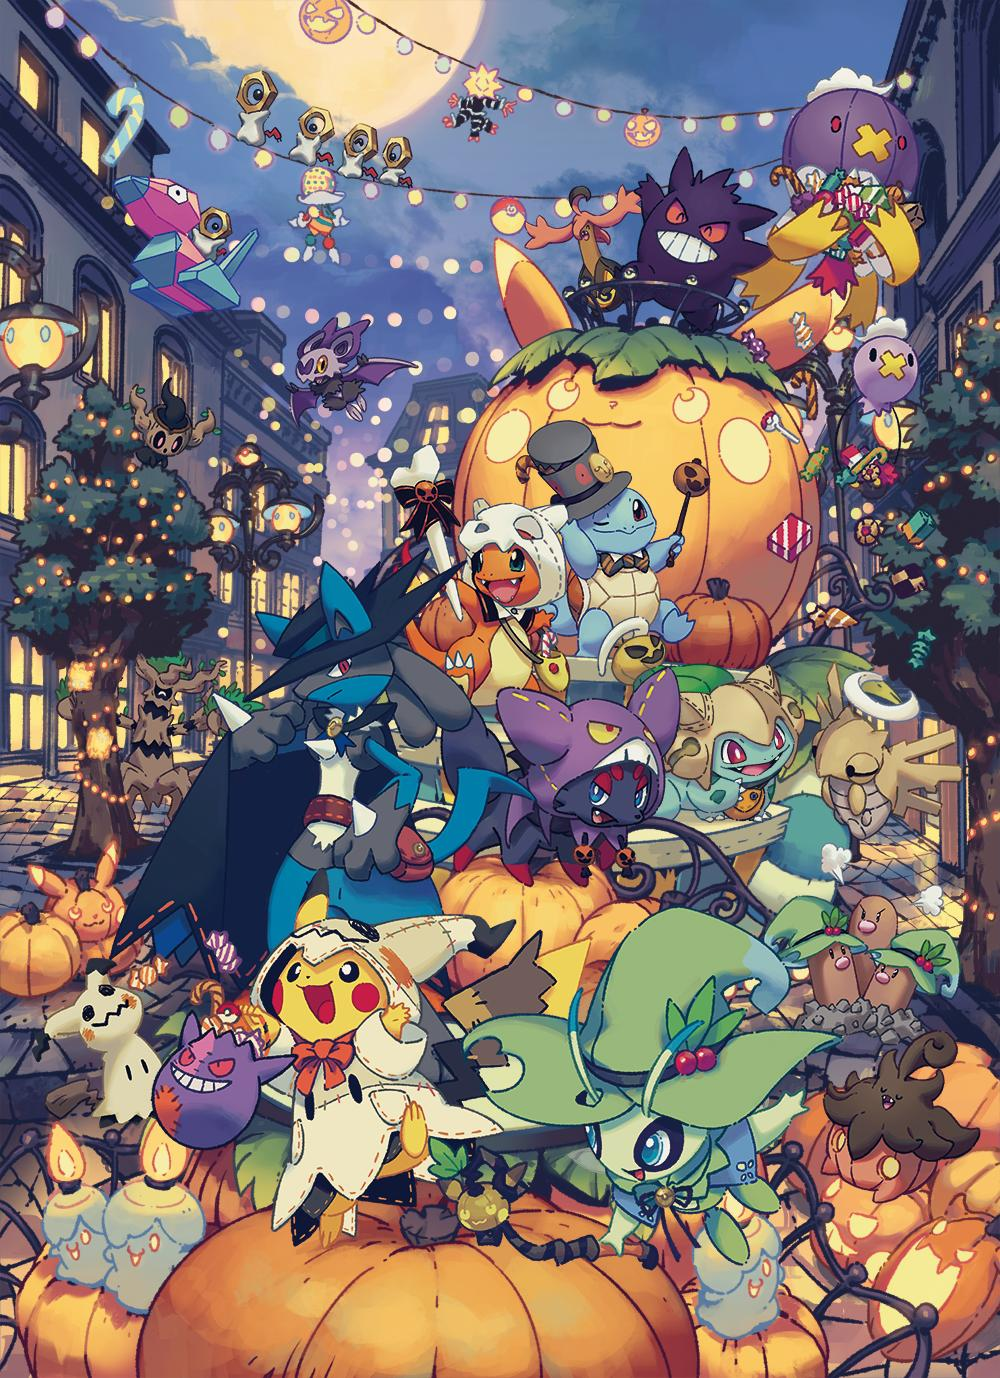 Pin By Melody On 1枚絵 Pokemon Backgrounds Pokemon Ghost Pokemon